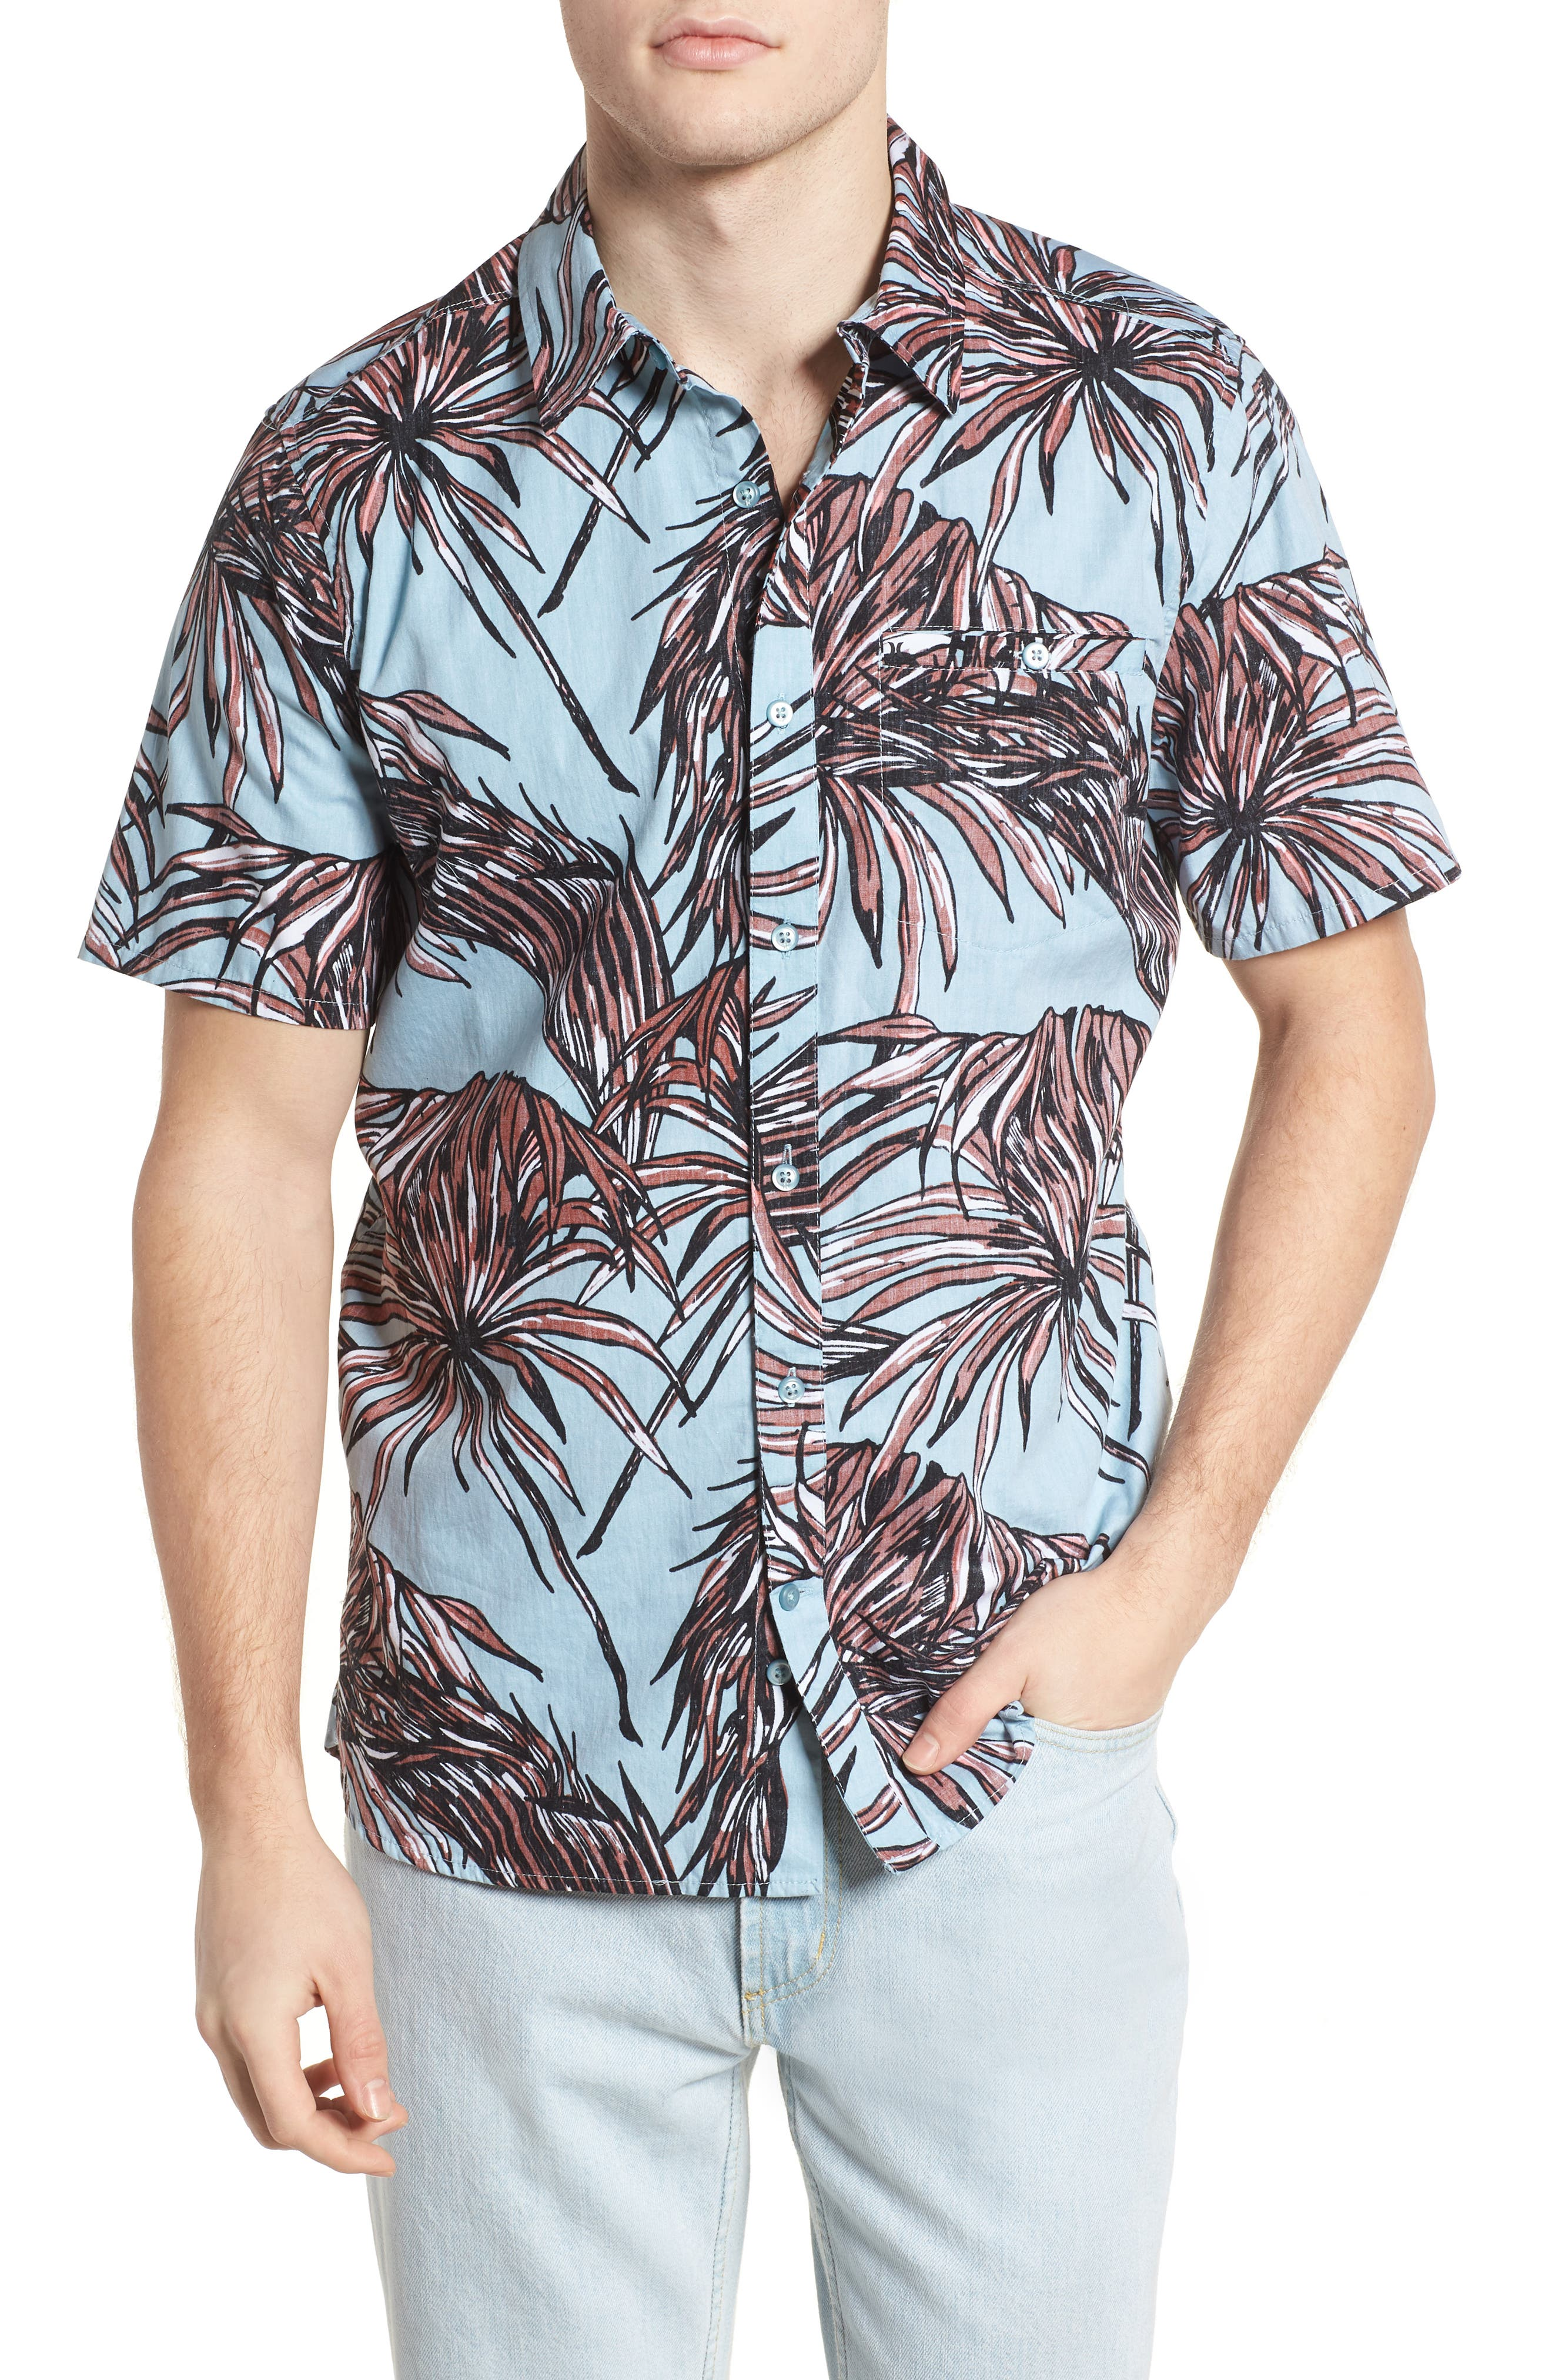 Koko Shirt,                             Main thumbnail 1, color,                             Ocean Bliss